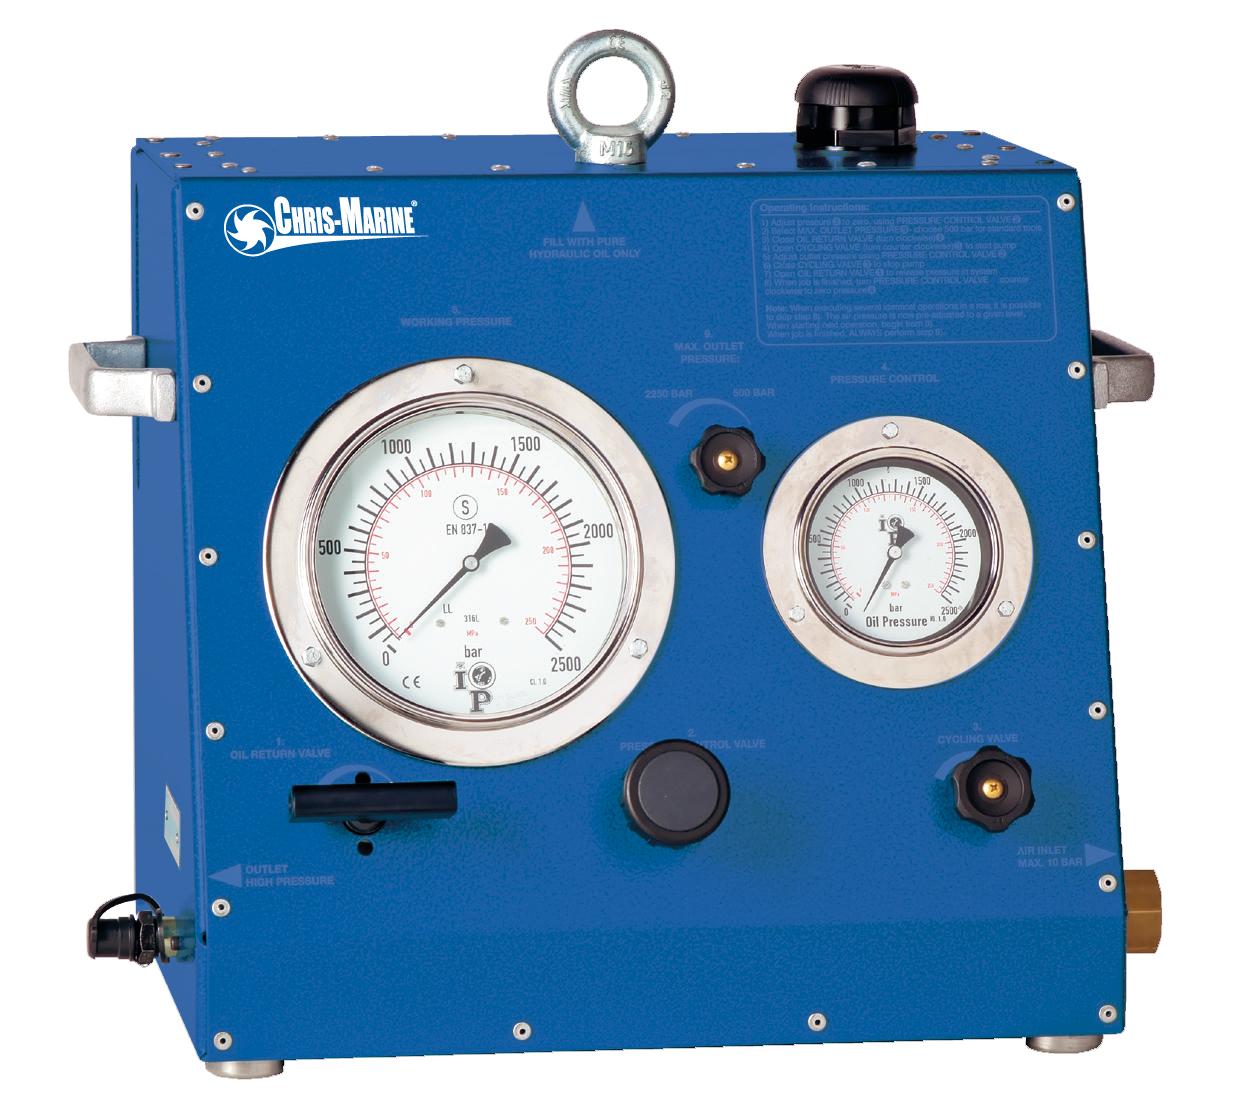 Hydraulic Power Unit Series / HPU | Chris-Marine